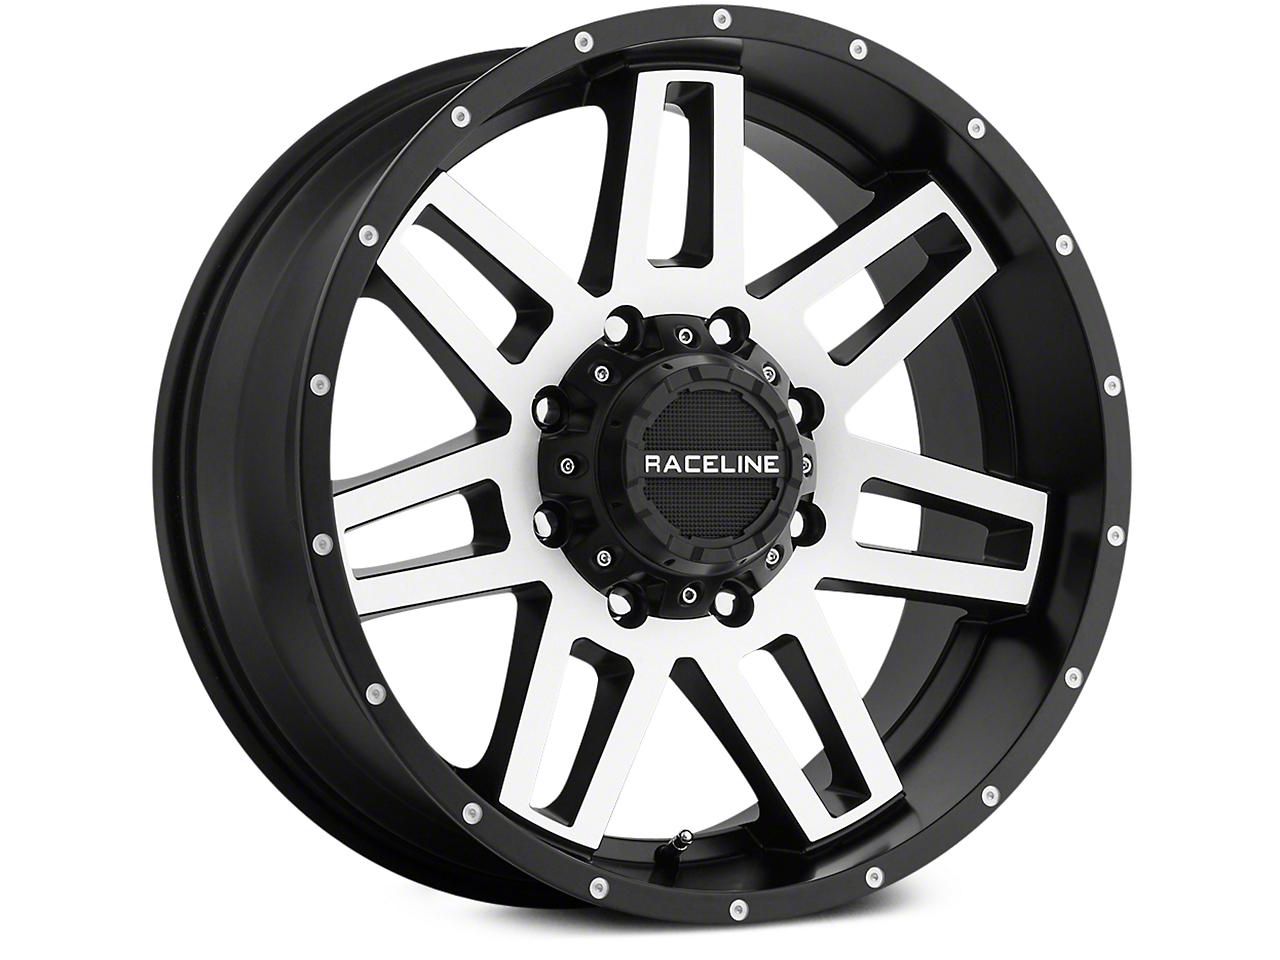 Raceline Injector Black Machined 6-Lug Wheel - 20x9 (07-18 Sierra 1500)